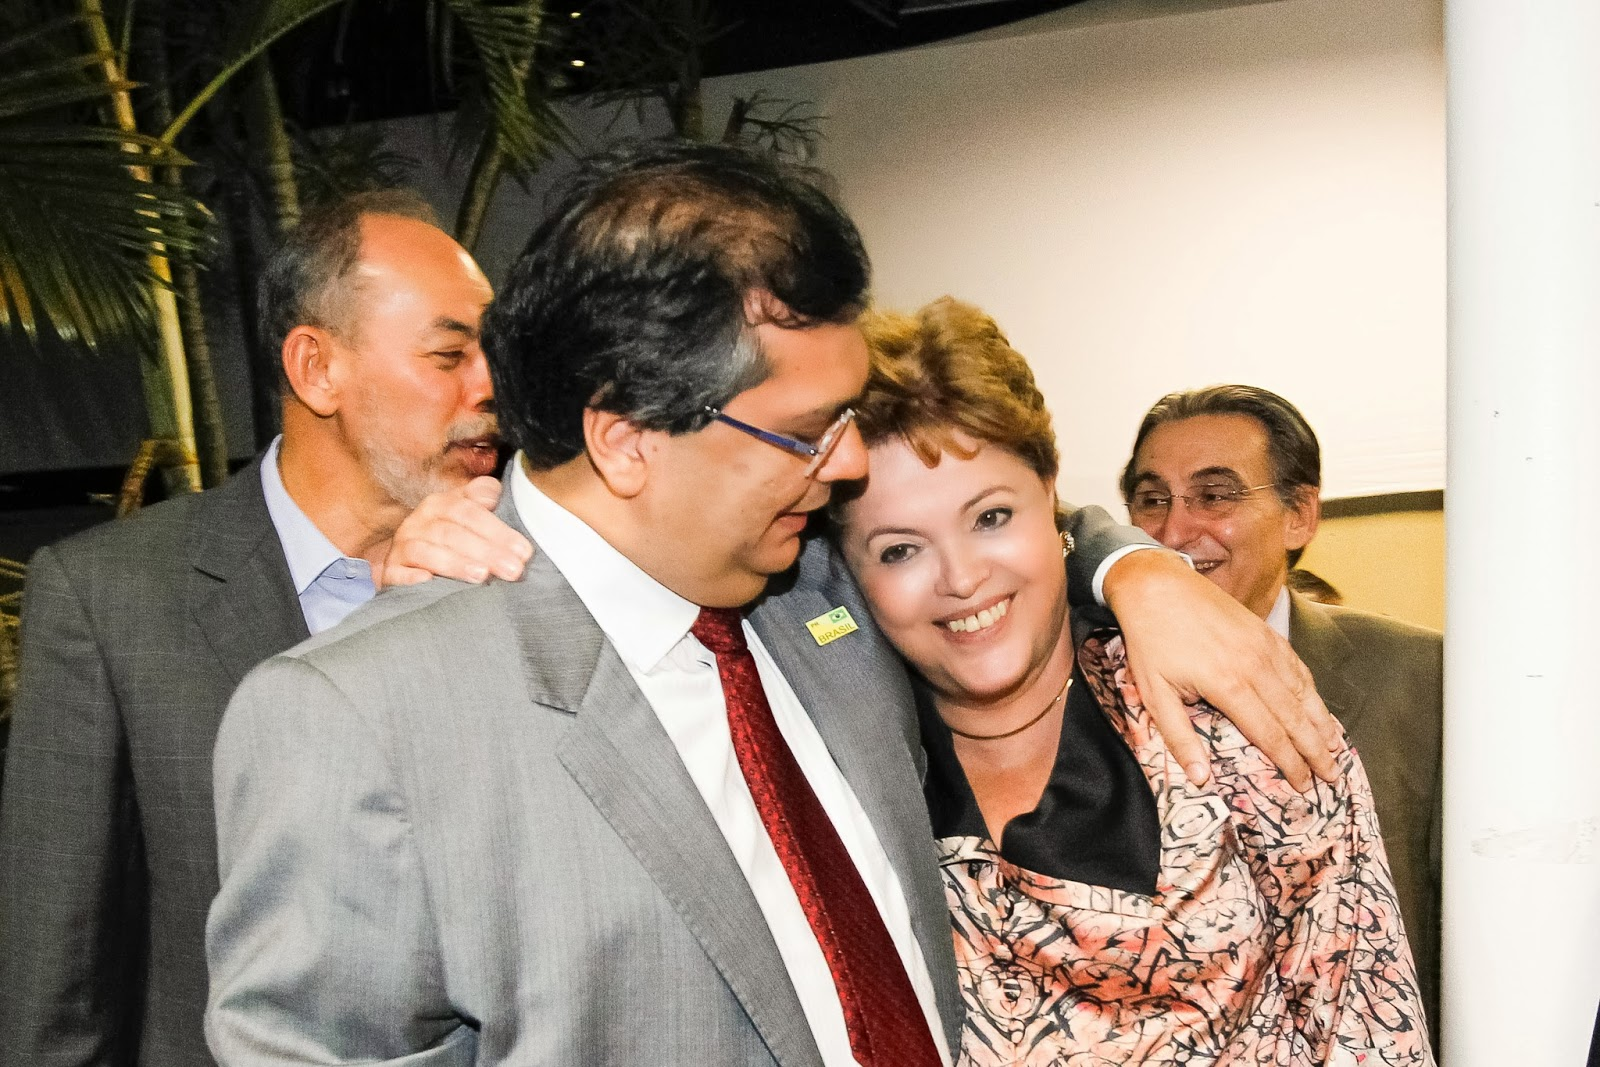 http://4.bp.blogspot.com/-4m-Ugyj83jo/Uouc4iN9DlI/AAAAAAAAPw0/fNLEYq13SWw/s1600/Flavio+Dino+com+Dilma.jpg